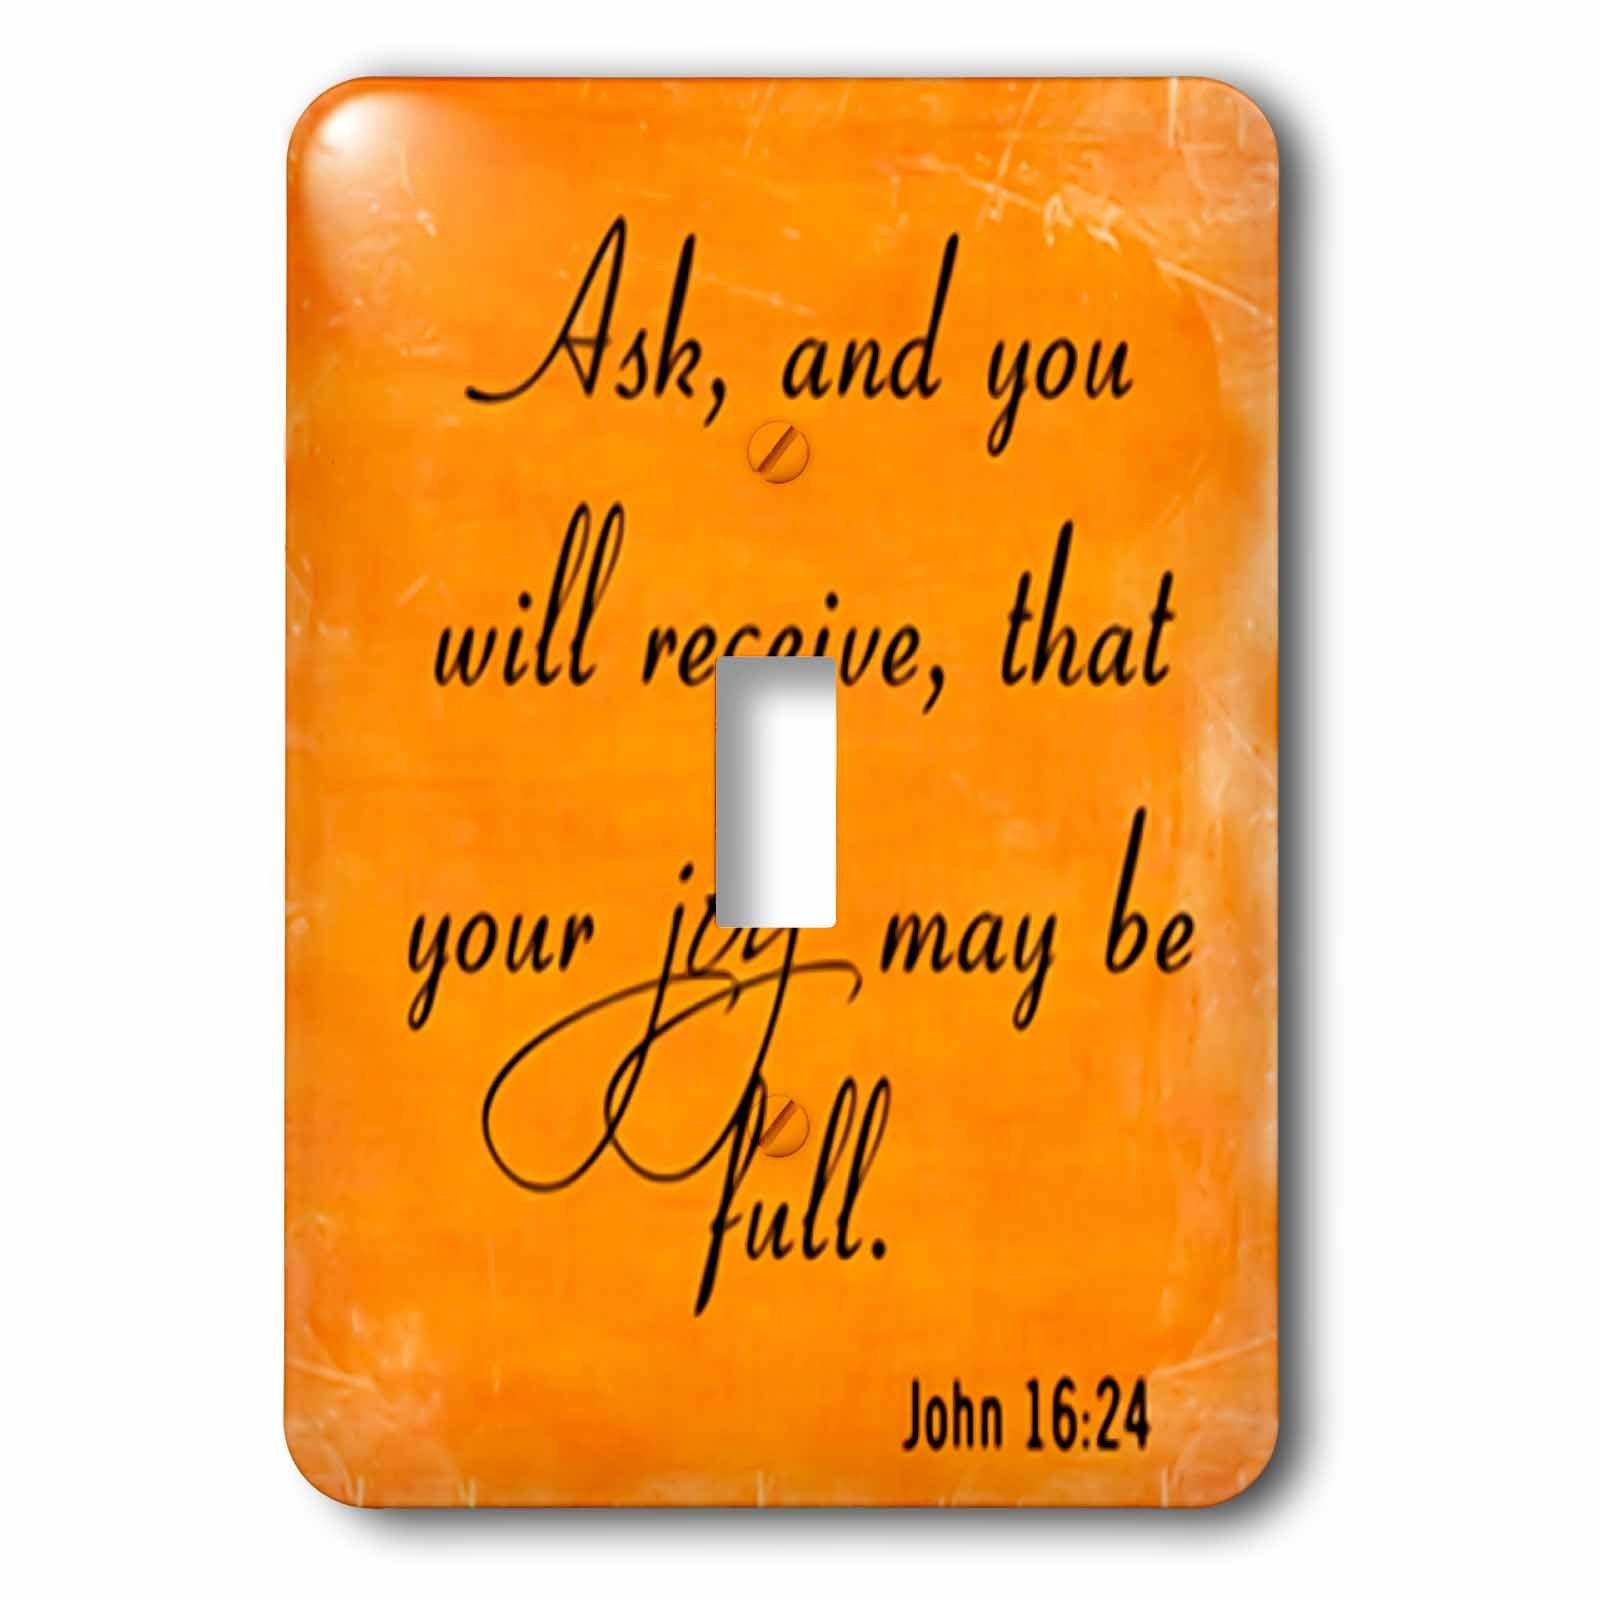 3dRose LLC 3dRose LLC lsp_150081_1 Bible Verse John 16-24 Orange Background Bible Christian Inspirational Saying - Single Toggle Switch by 3dRose